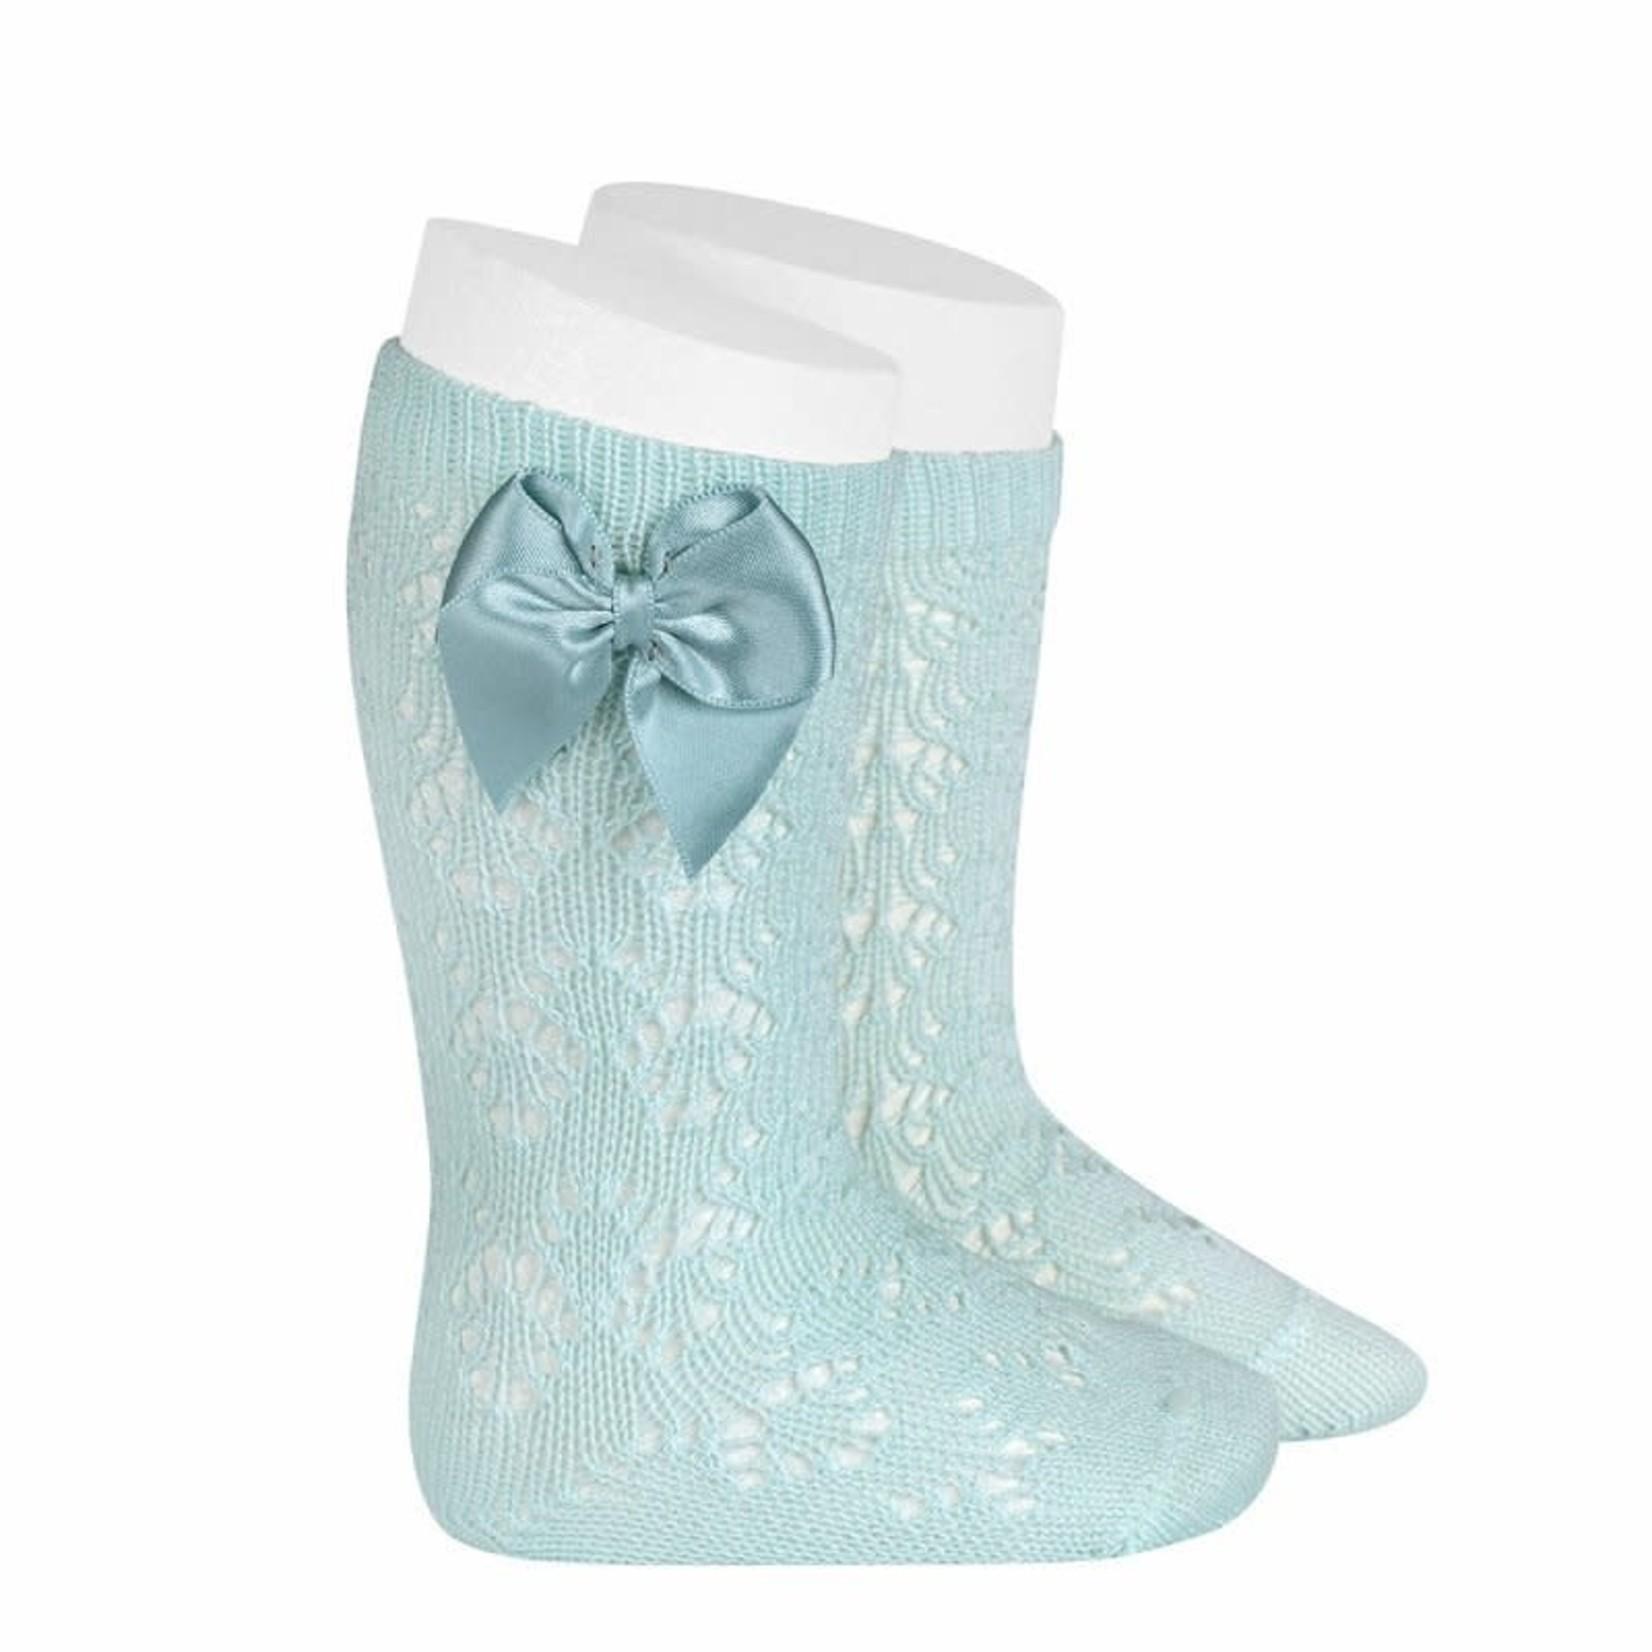 Condor Socks Open w/Bow - Aquamarine